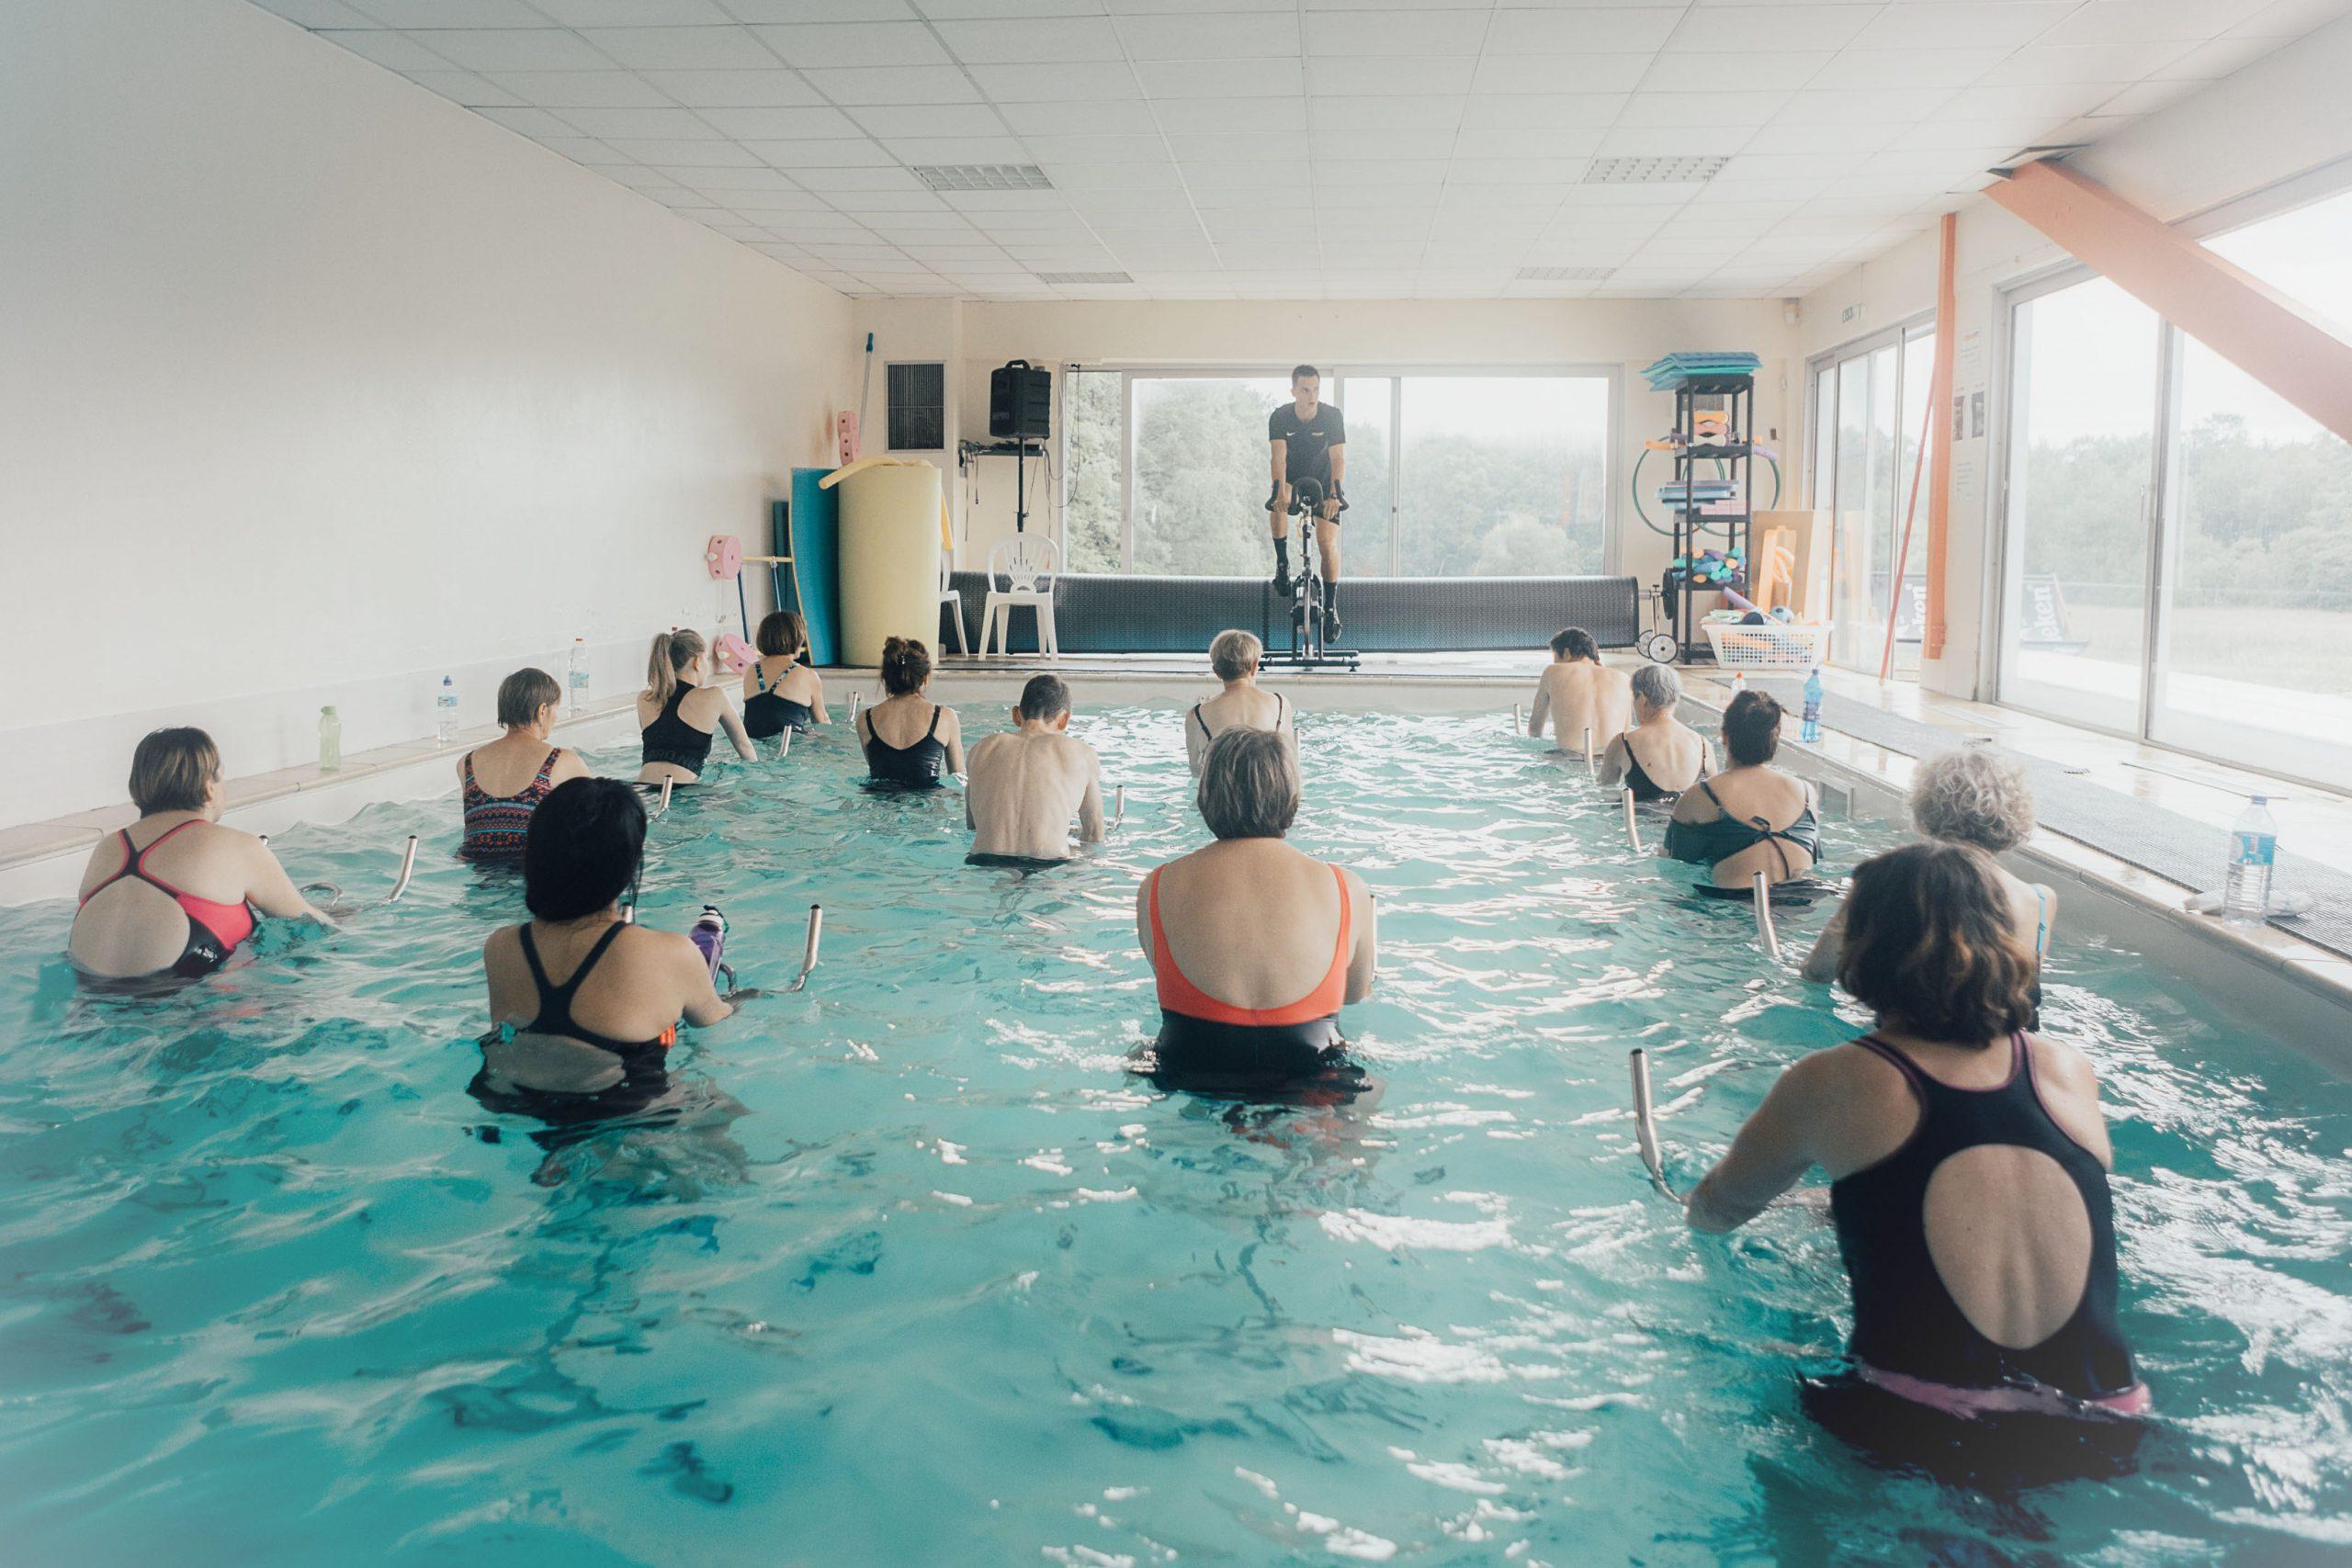 Urbanfit - Pratiquez Fitness|Musculation|Piscine|Squash à Musculation Piscine